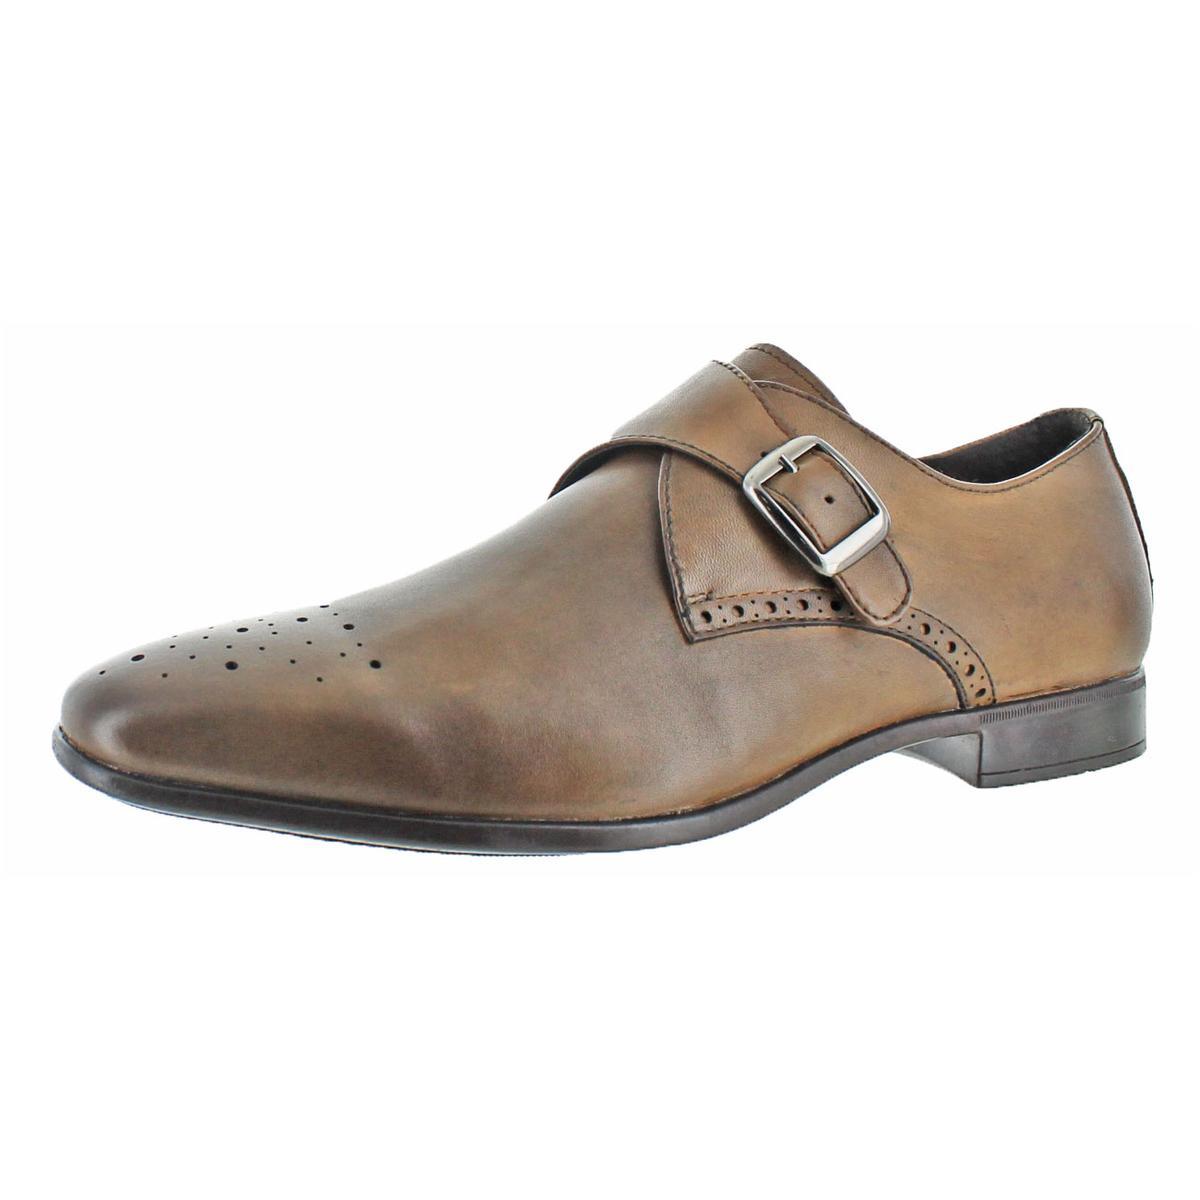 Charles-Jourdan-Jean-Men-039-s-Leather-Slip-On-Brogue-Loafer-Dress-Formal-Monk-Shoes